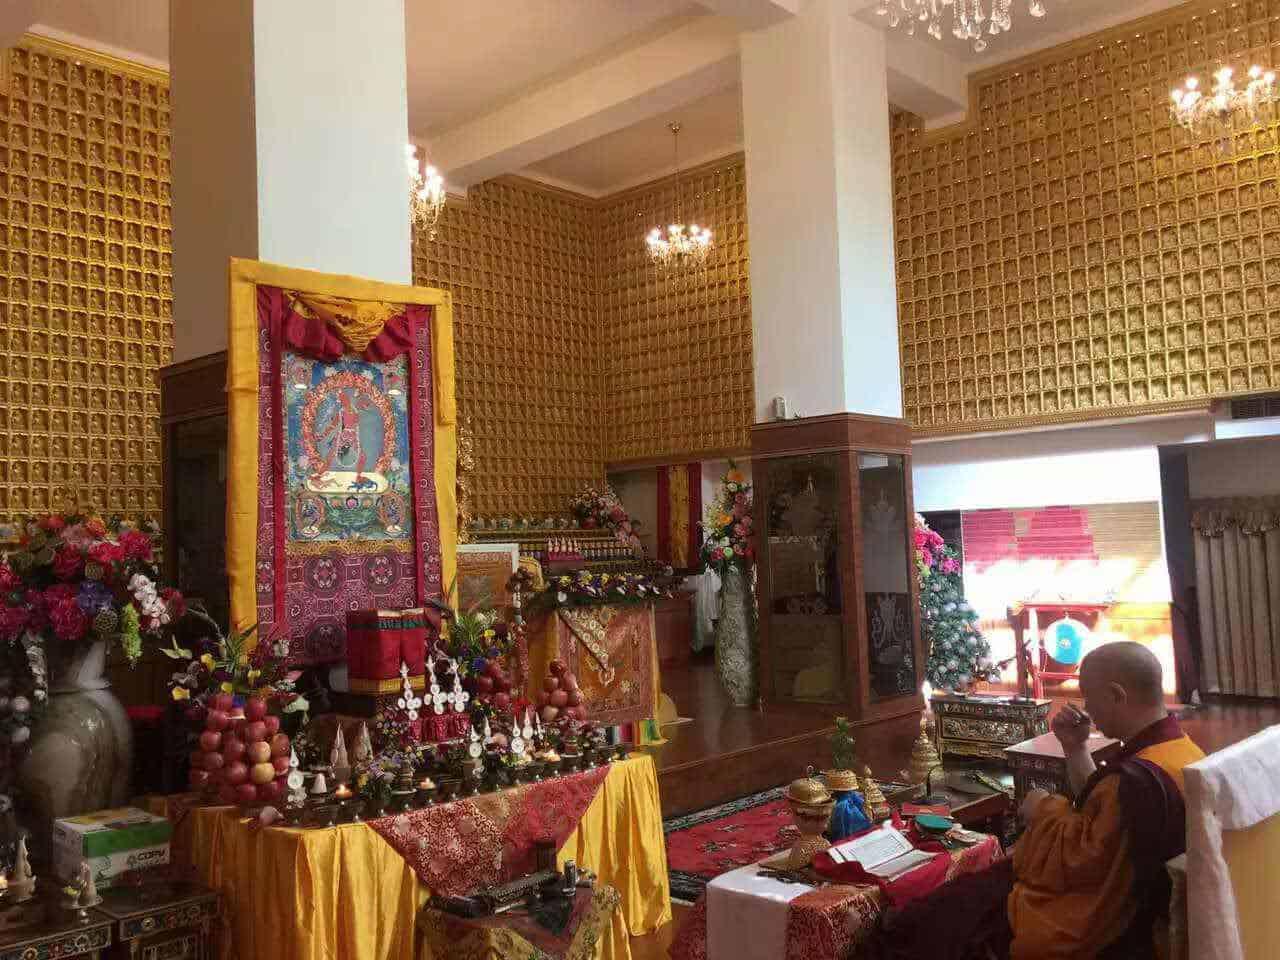 gosok-rinpoche-2016-10-266678379047067443